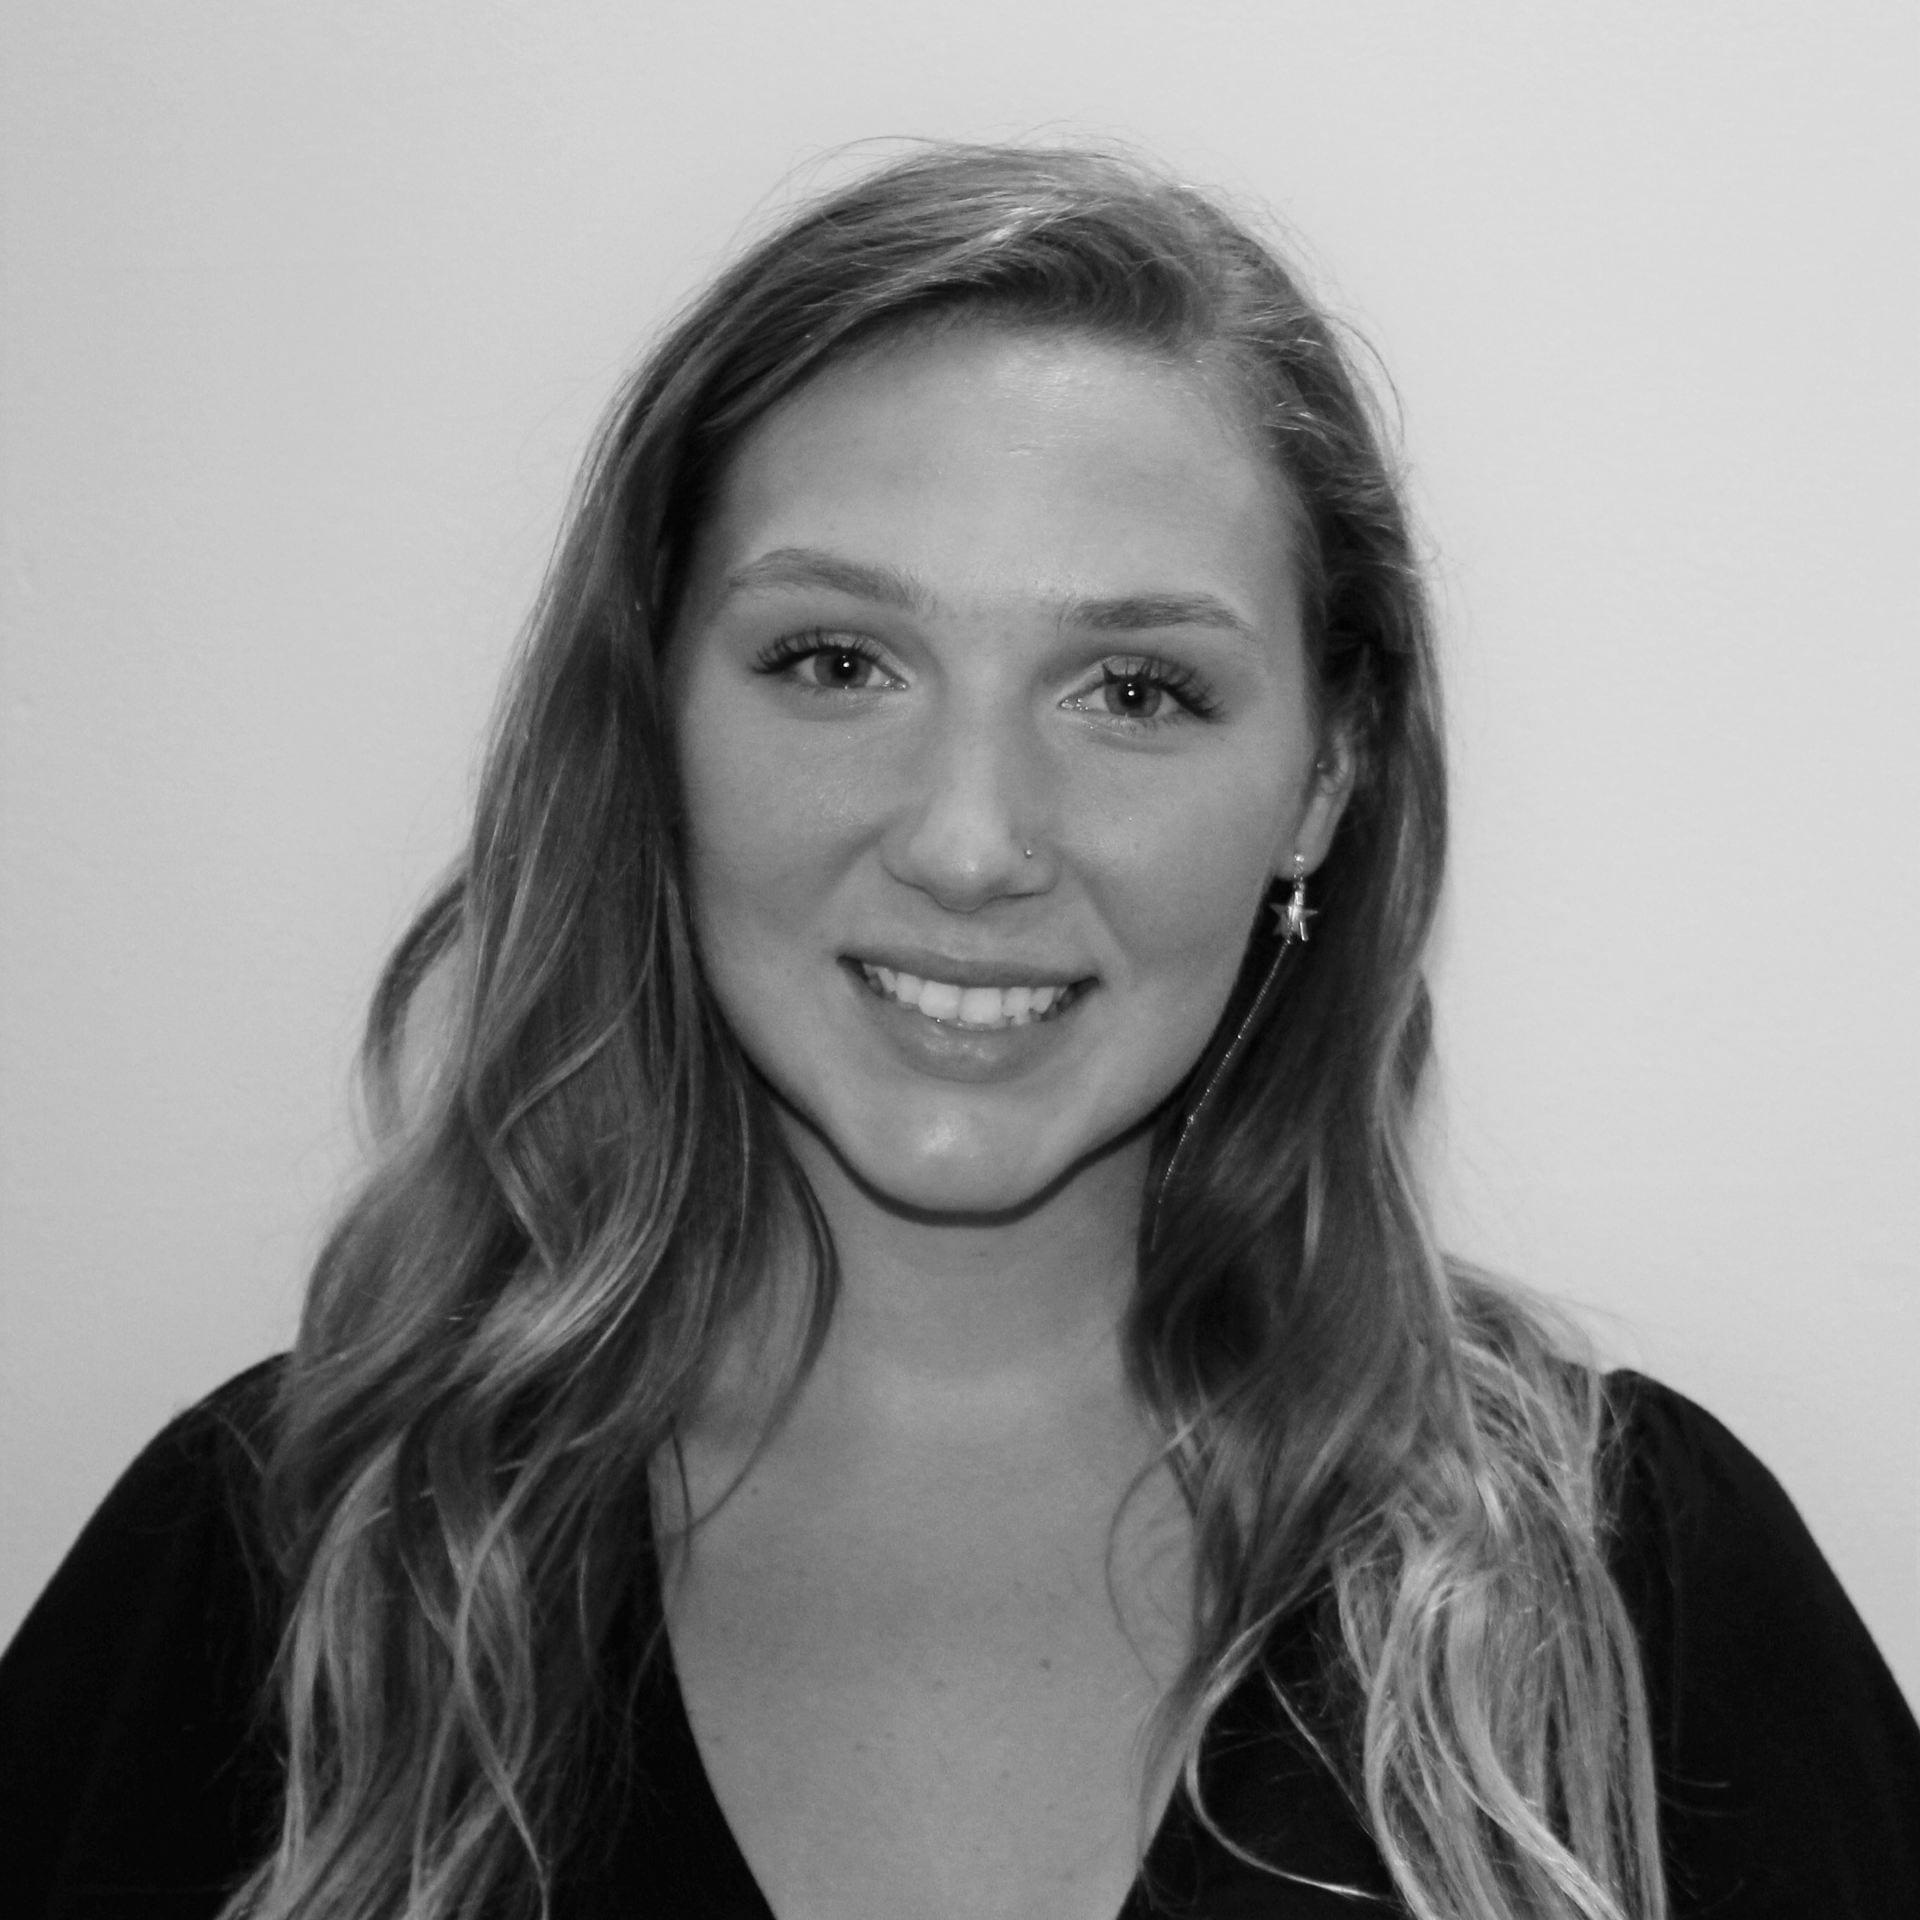 Rebecca Neusteter